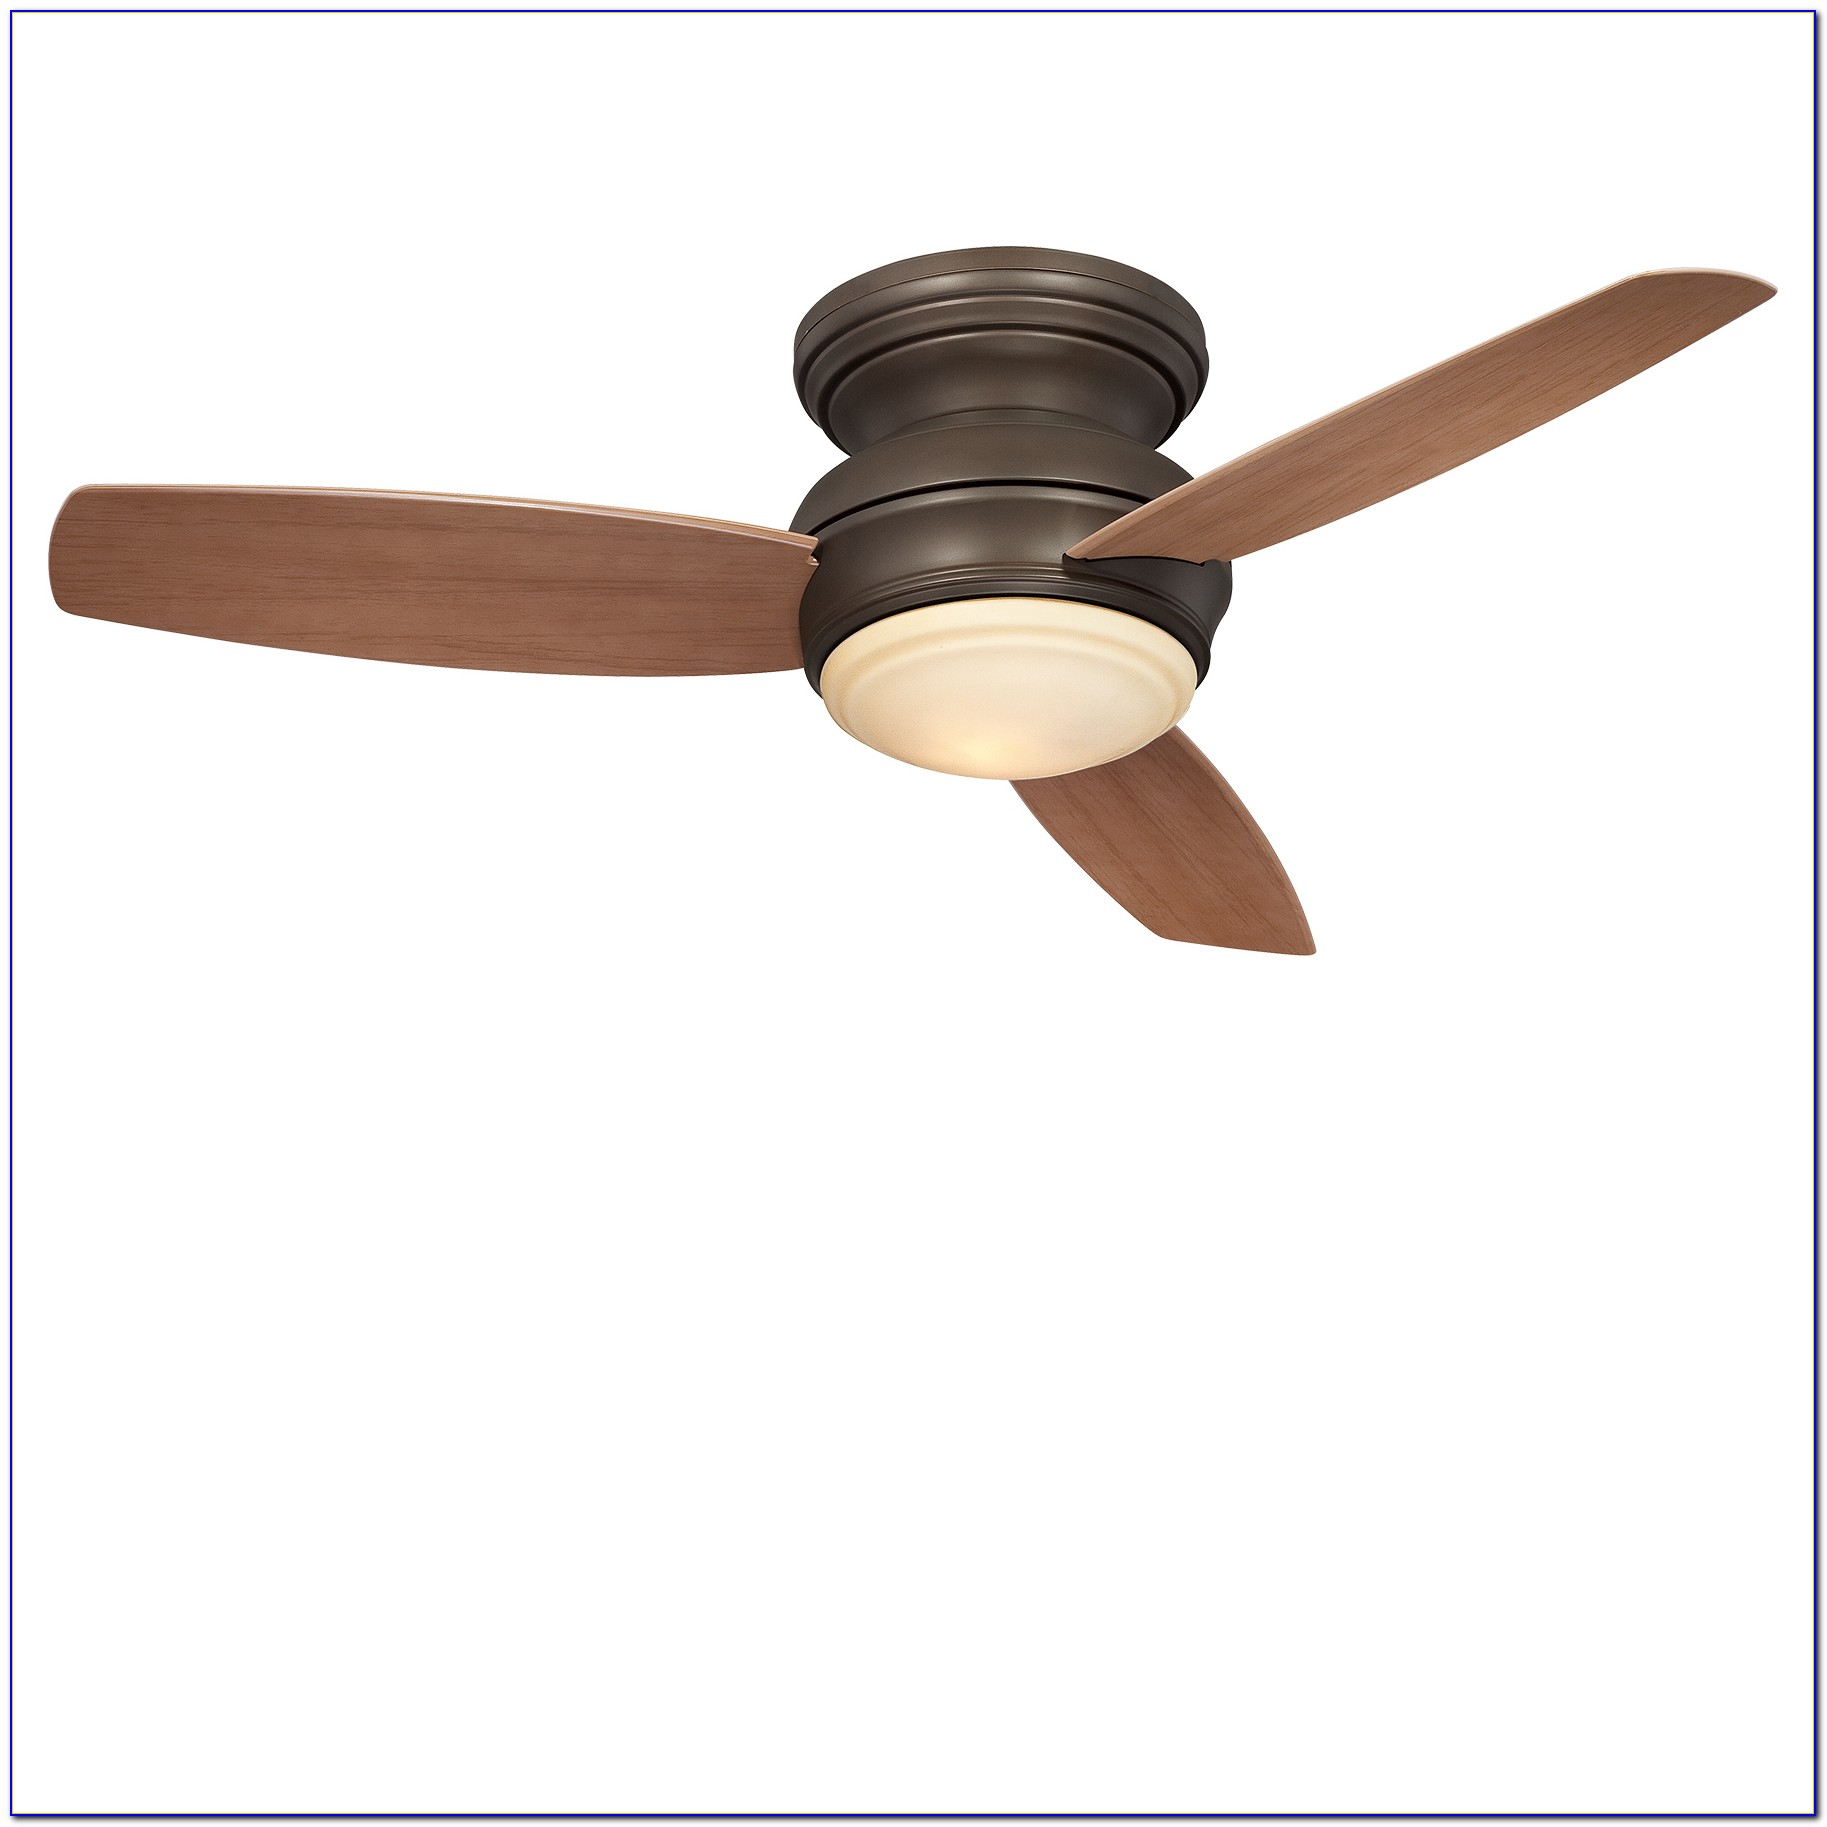 Roto Ceiling Fan Minka Aire